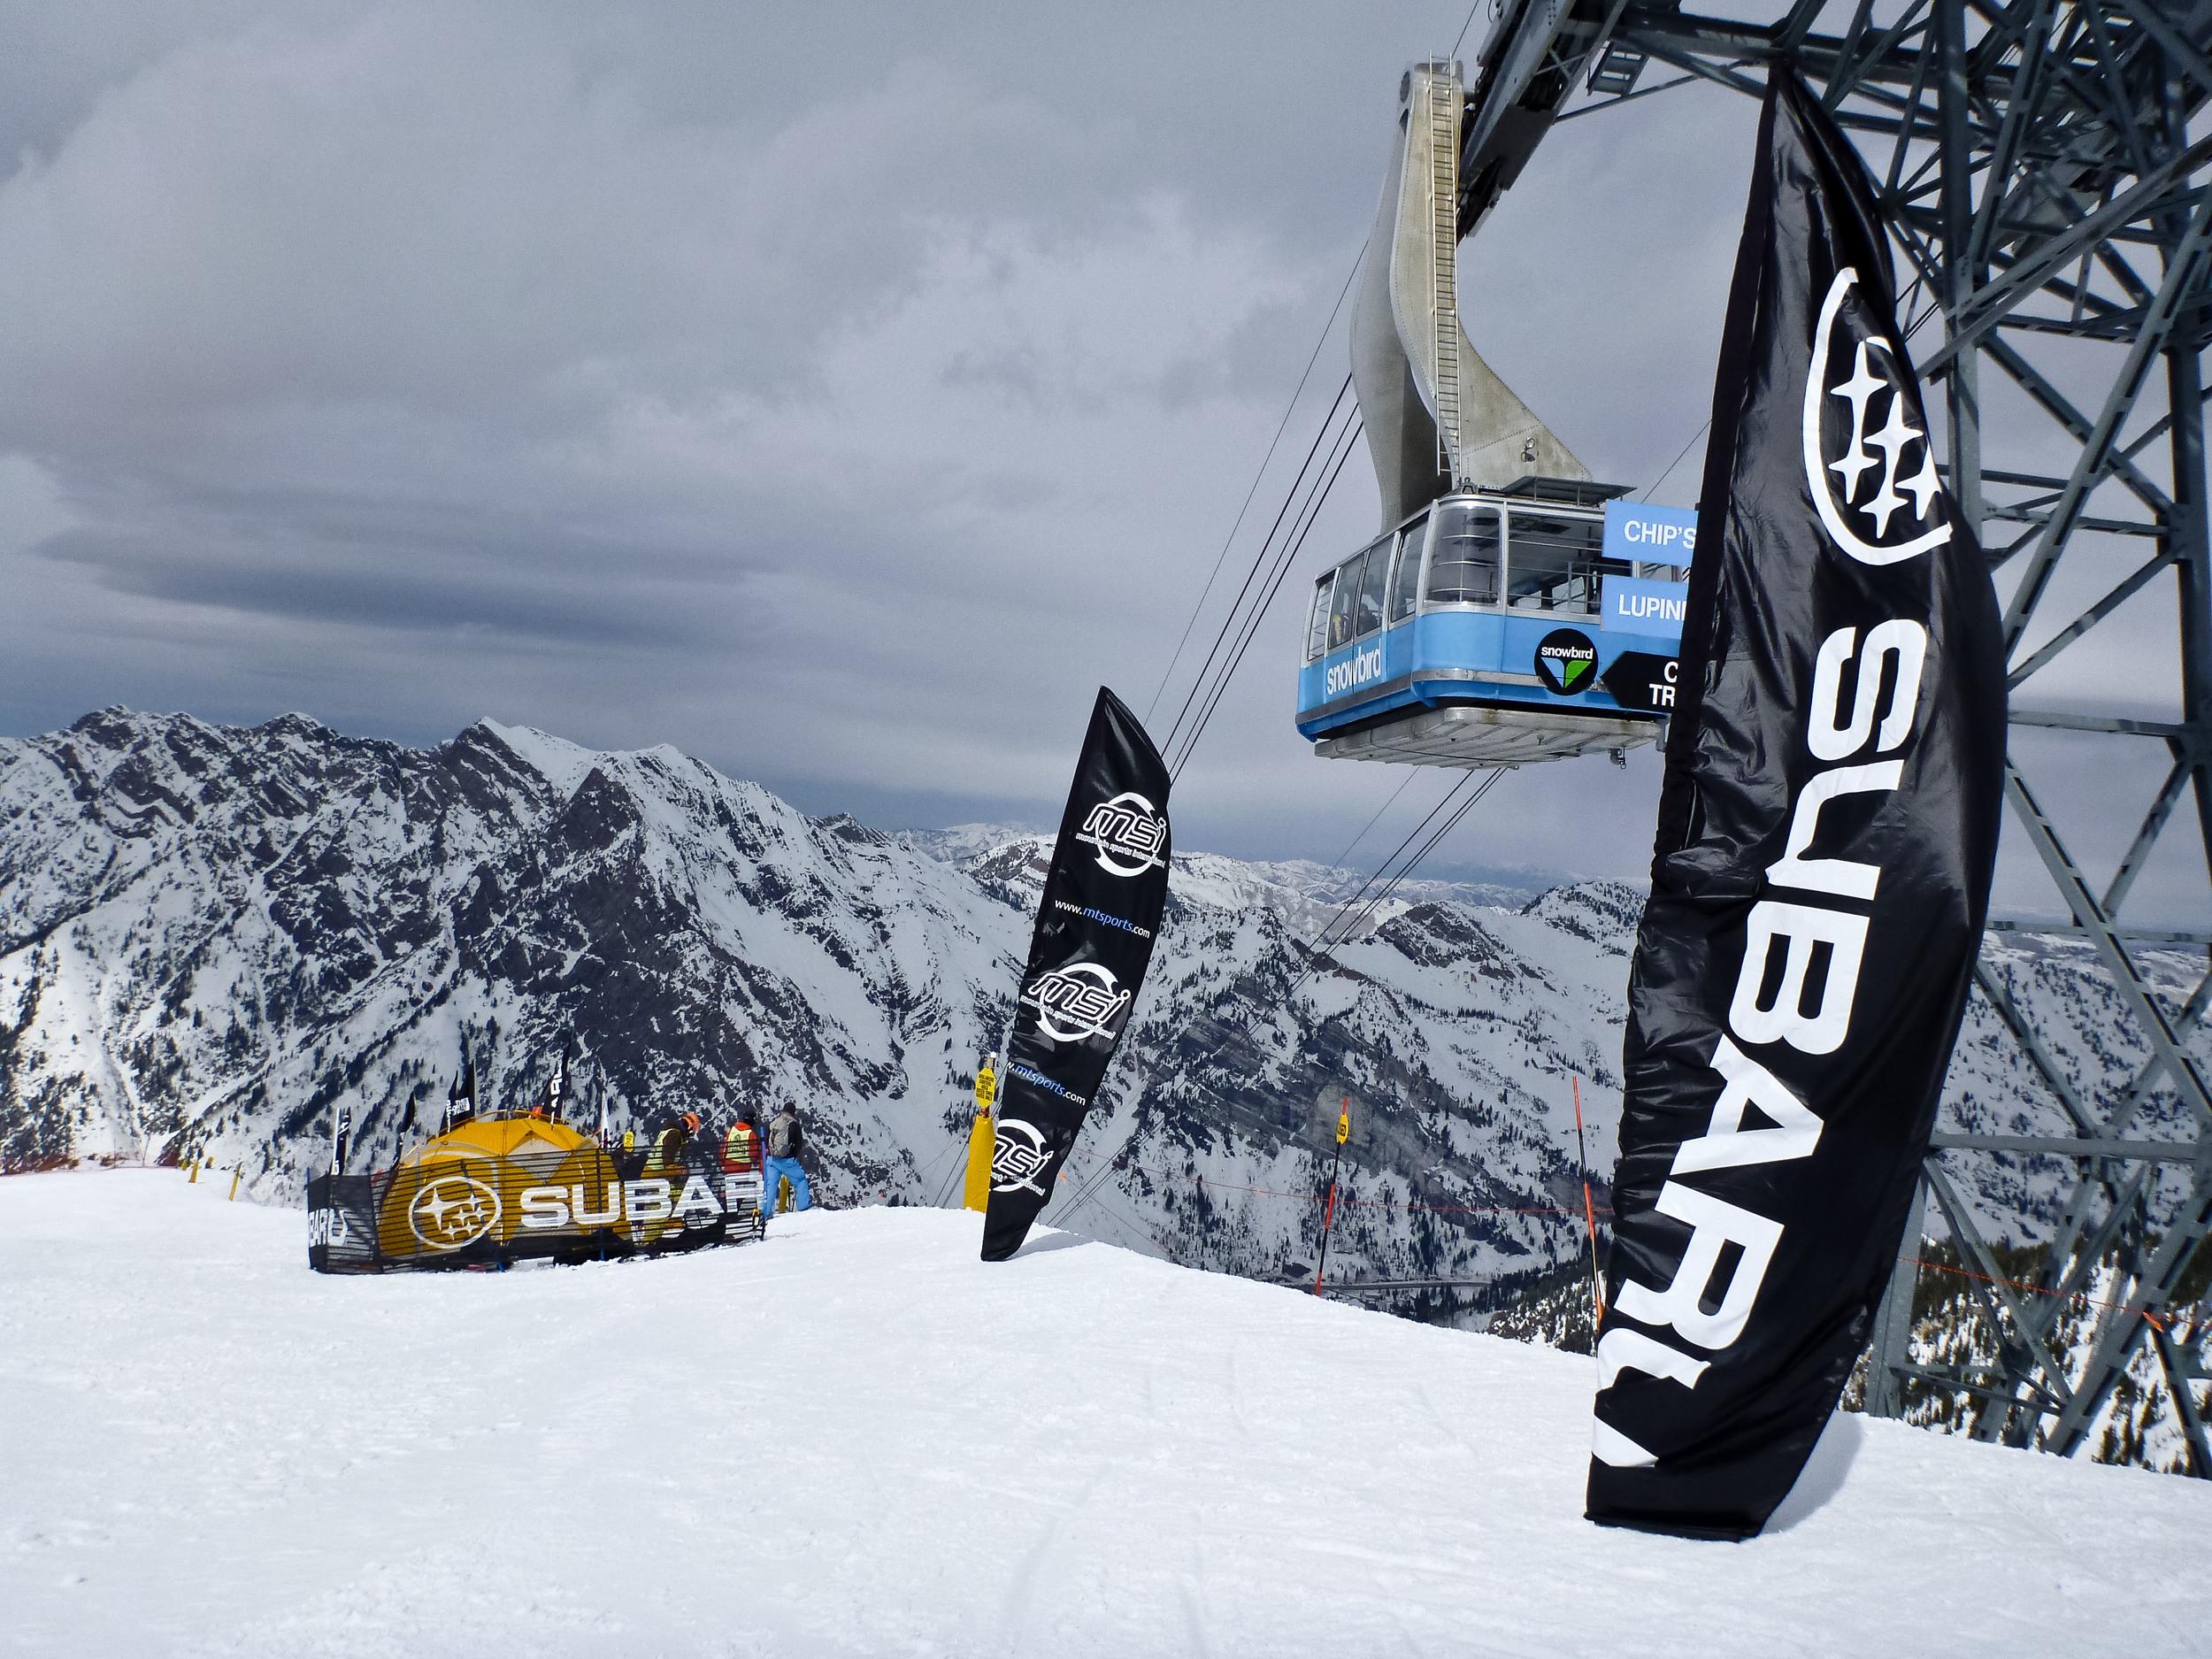 freeskiing world tour snowbird alue optics